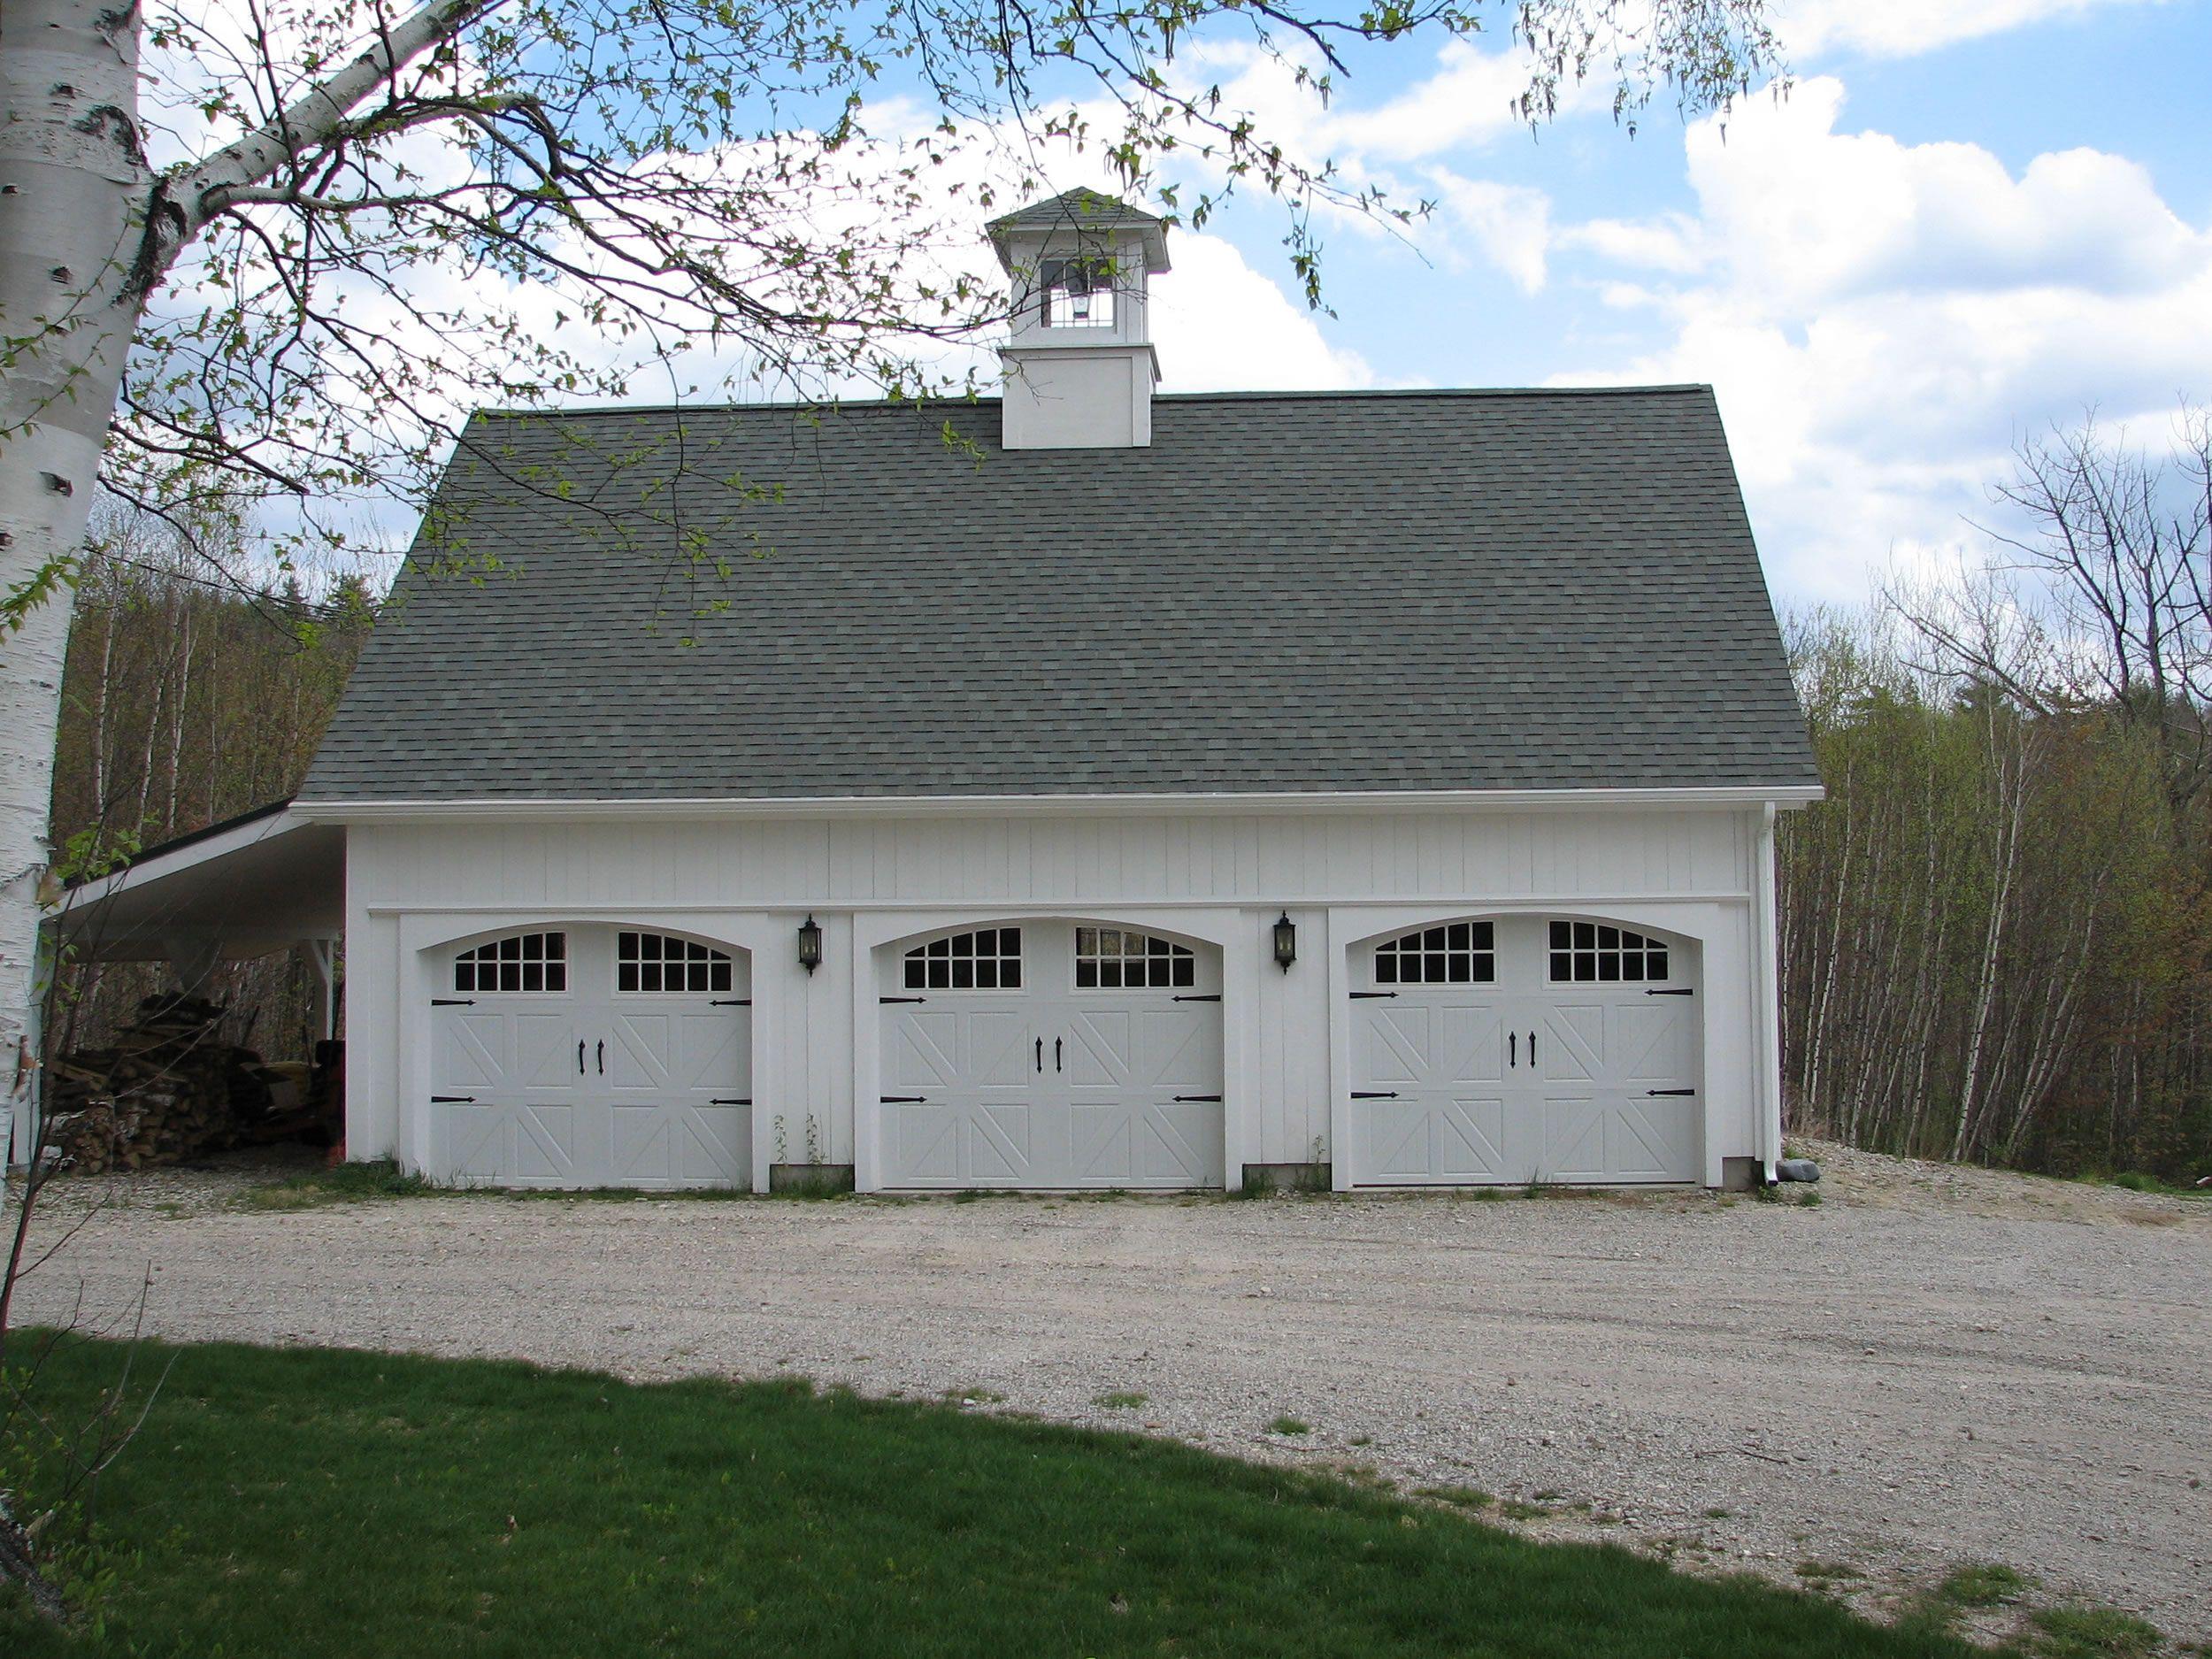 Three Car Barn | Dream Home | Carriage house garage, Pole barn ... on patio home with 3 car garage, pole barn home with front porch, pole barn home with loft, pole barn home with basement,